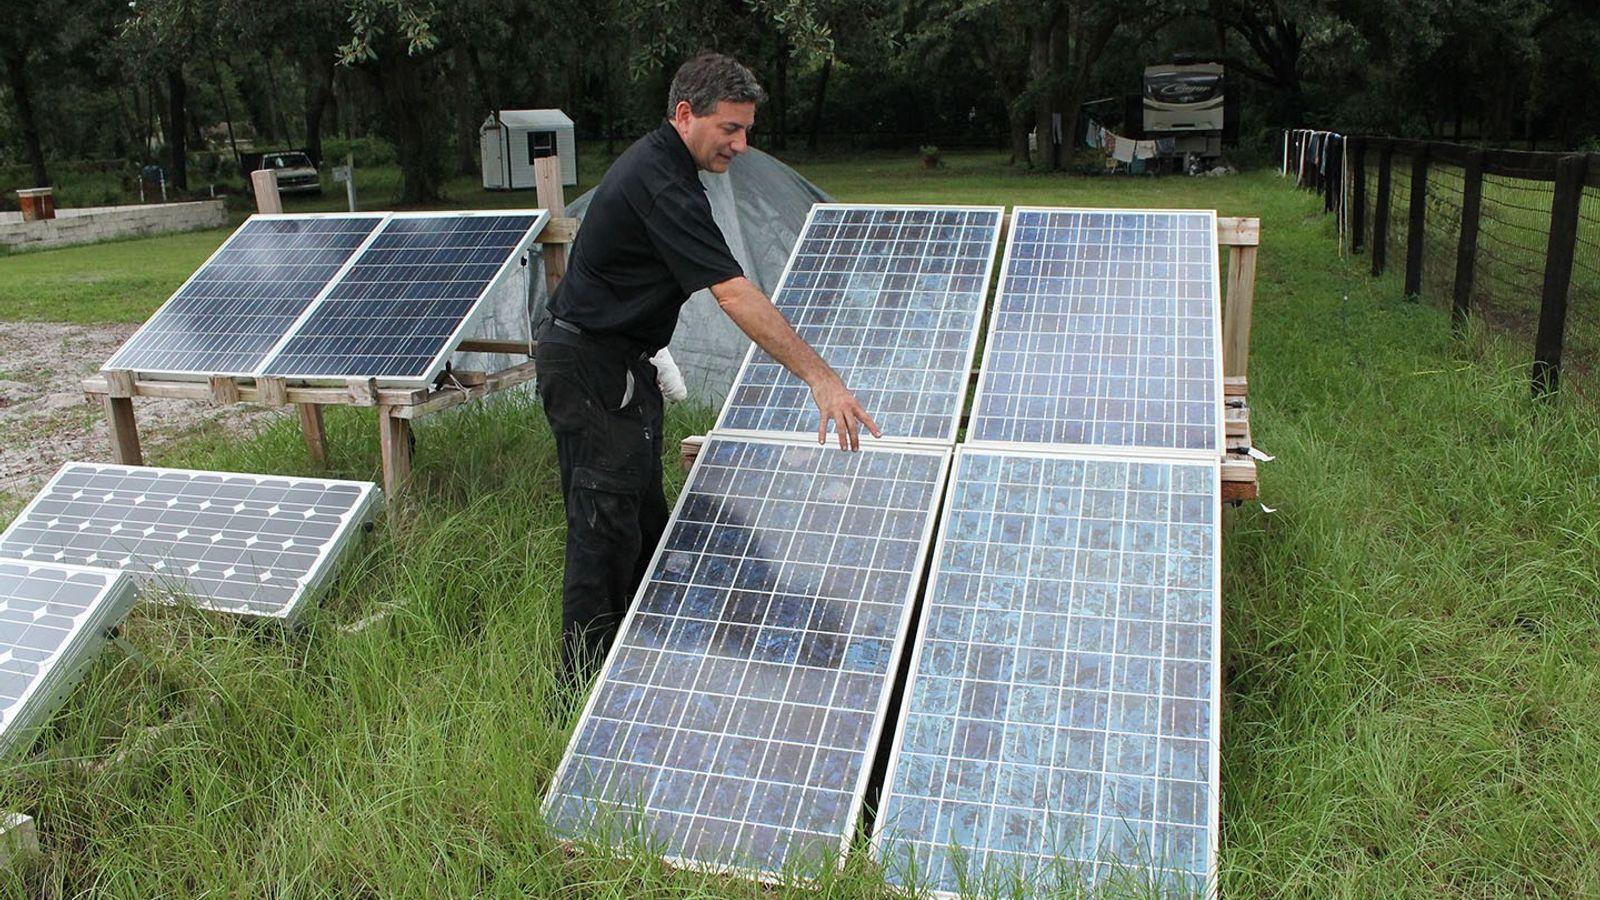 Nat Geo explorer T.H. Culhane describes how solar panels help power his home.